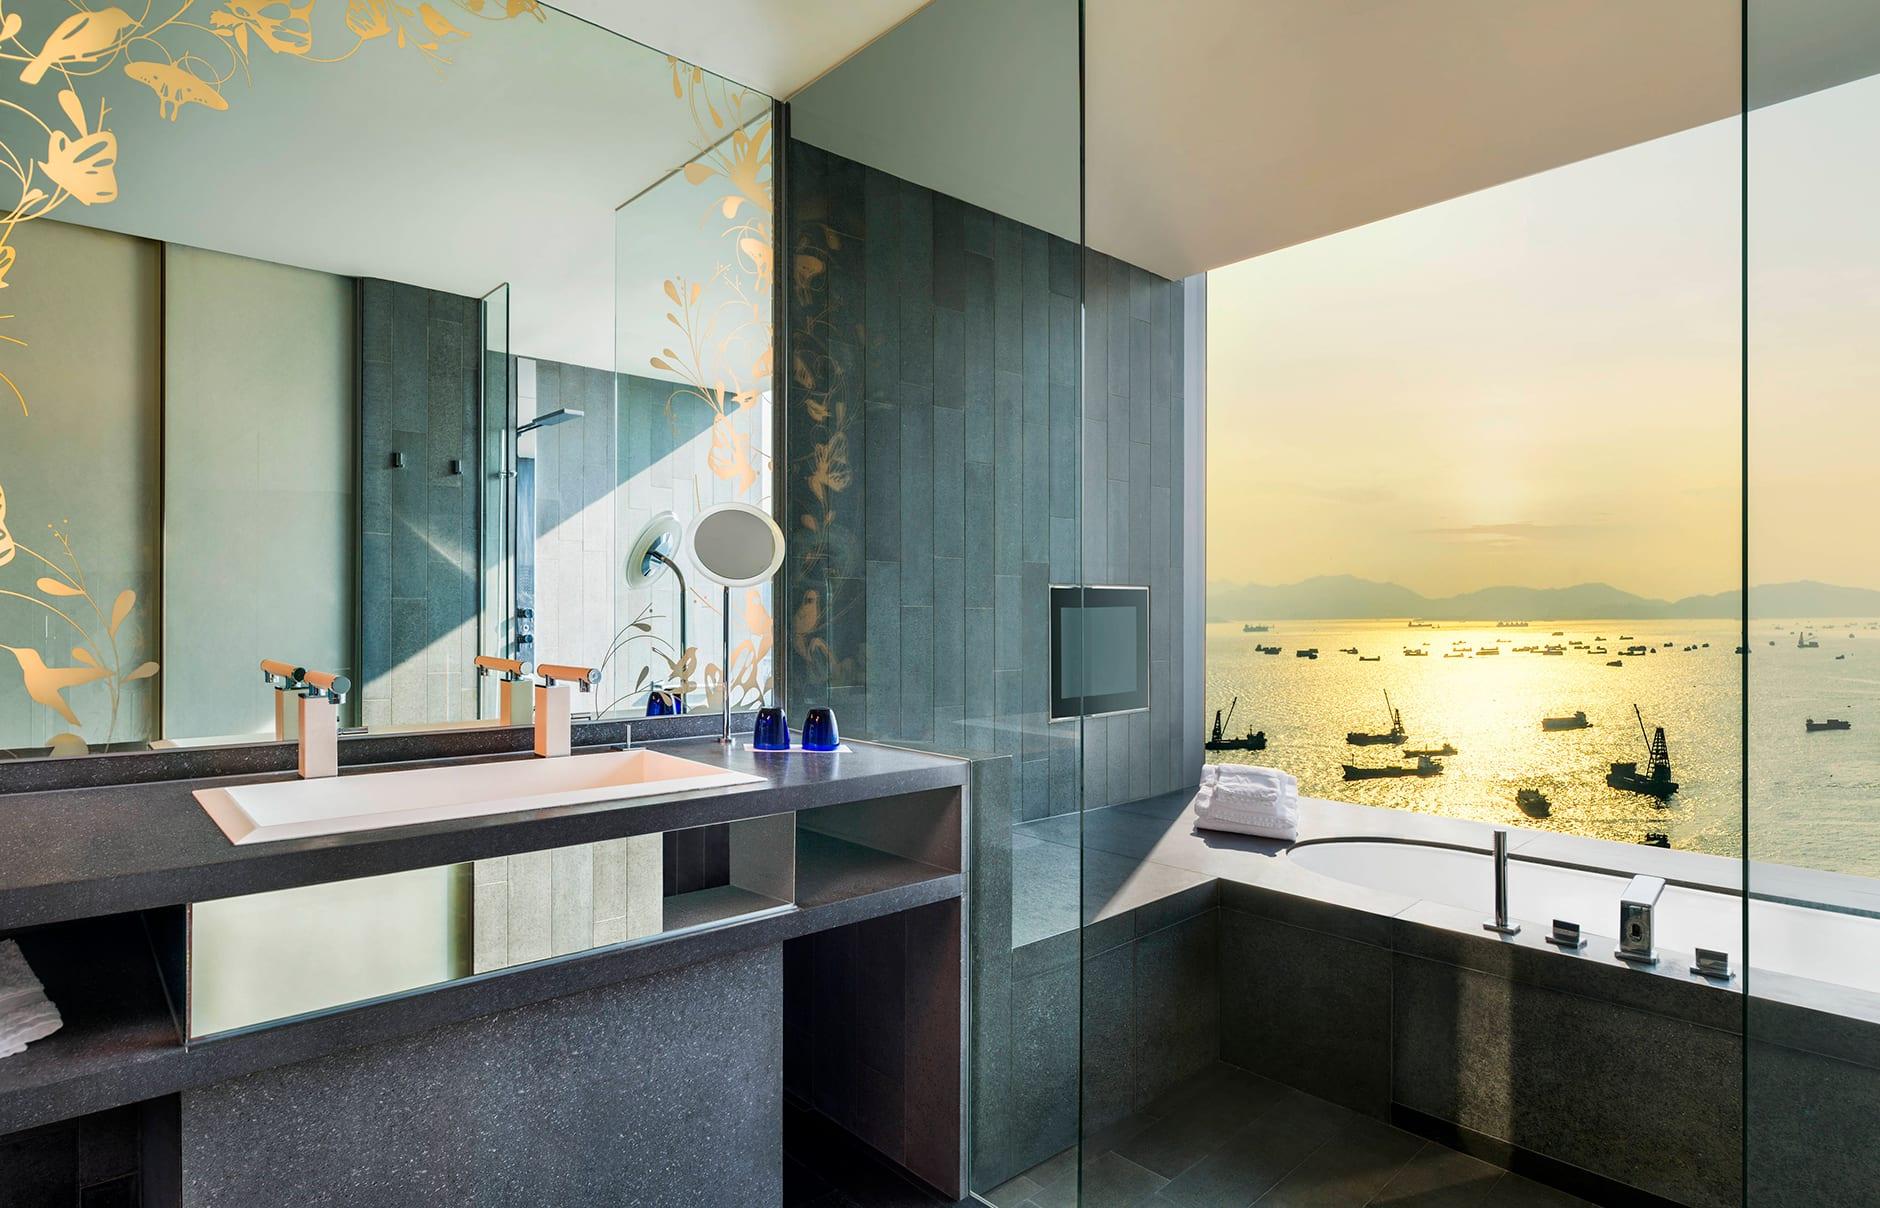 W Hong Kong - Hong Kong. Hotel Review by TravelPlusStyle. Photo © Marriott International